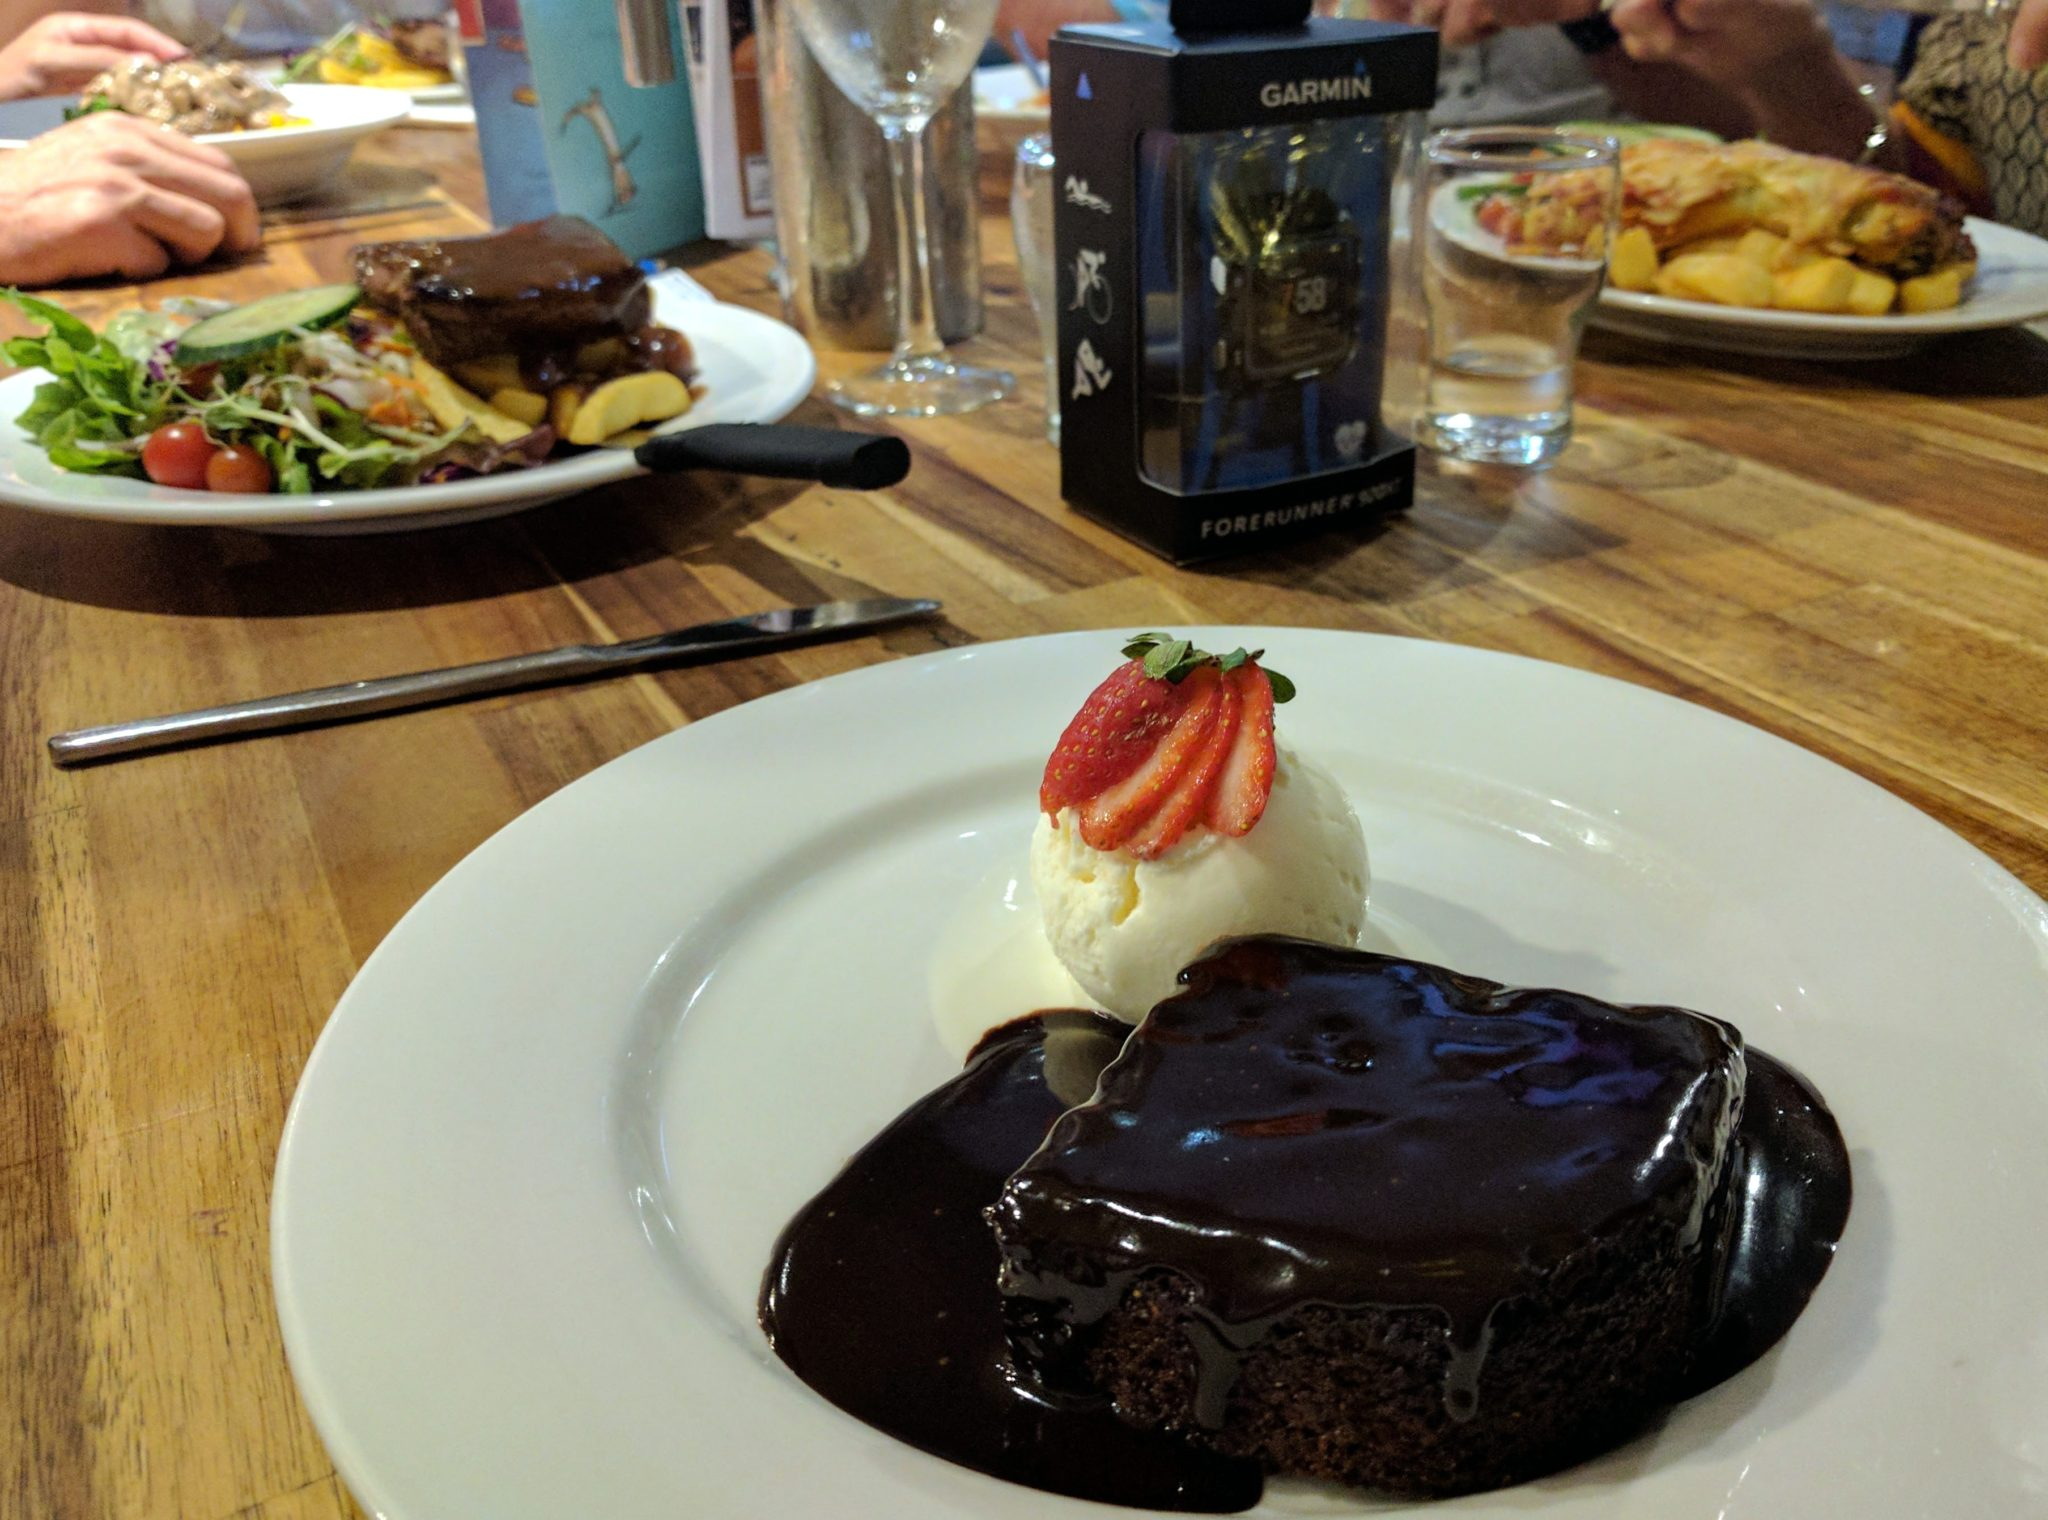 Steak, steak, pasta, schnitzel, steak, mud cake. Those are our orders.